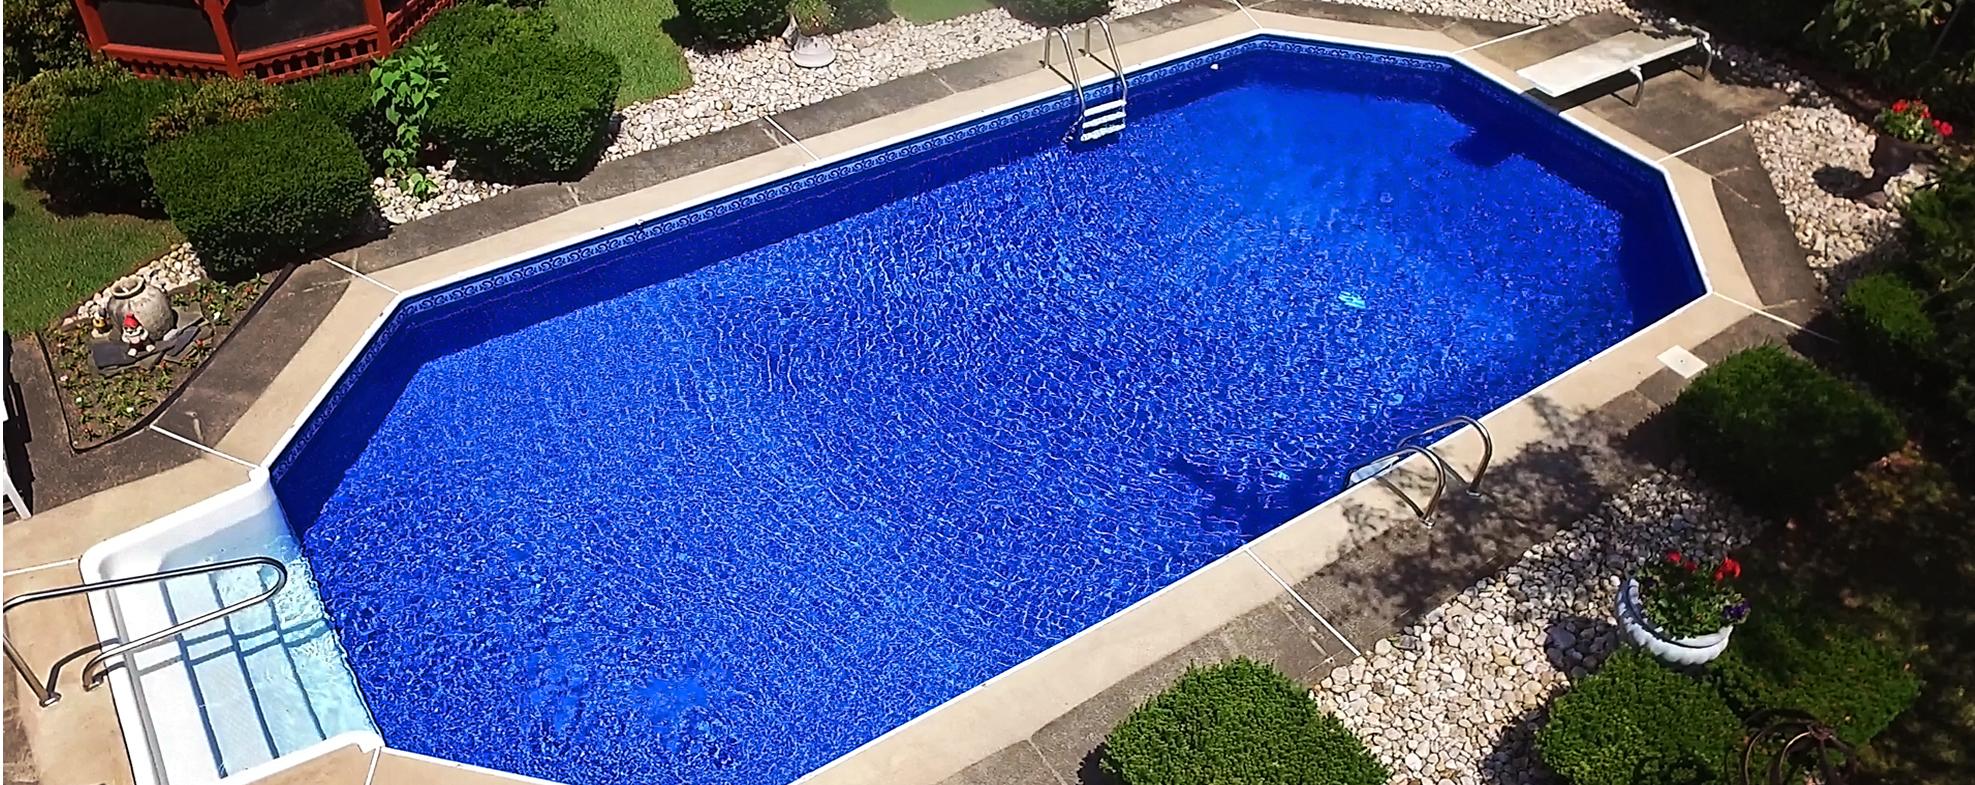 Pool Service Maintenance And Renovation Company Monmouth